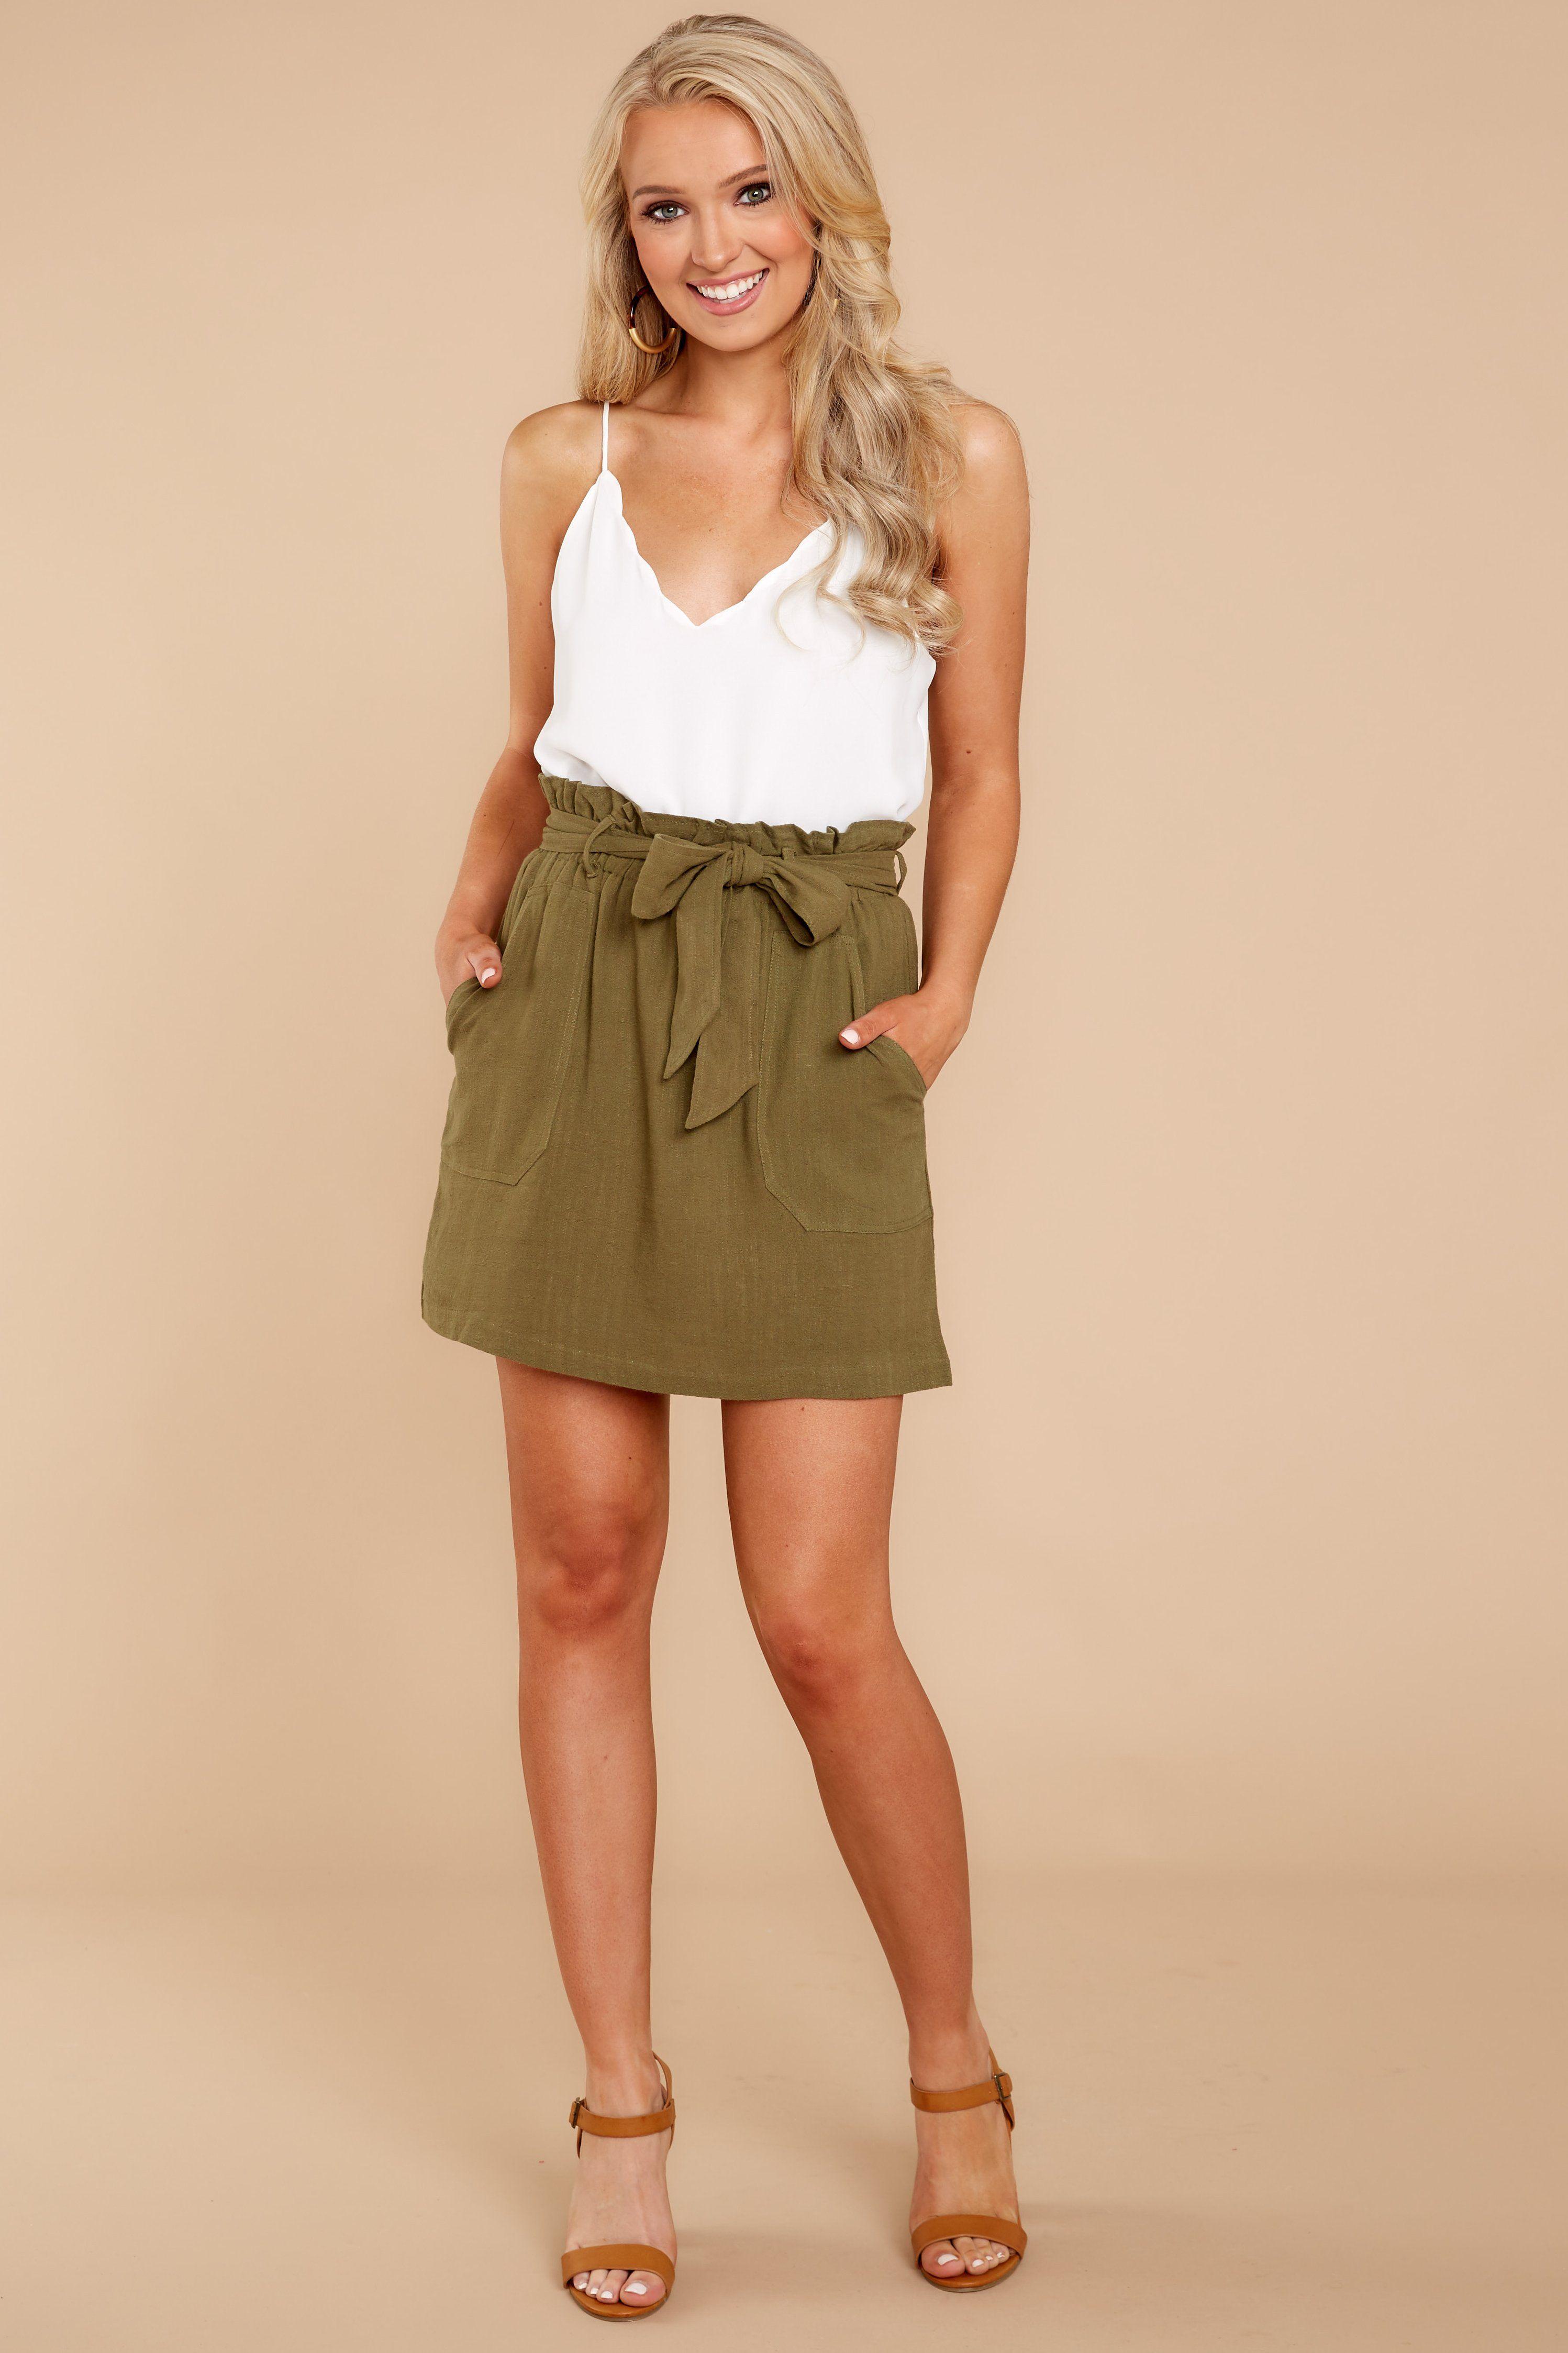 5ff64ddd67 Trendy Olive Green Skirt - Chic Olive Skirt - Skirt -$38.00 – Red Dress  Boutique